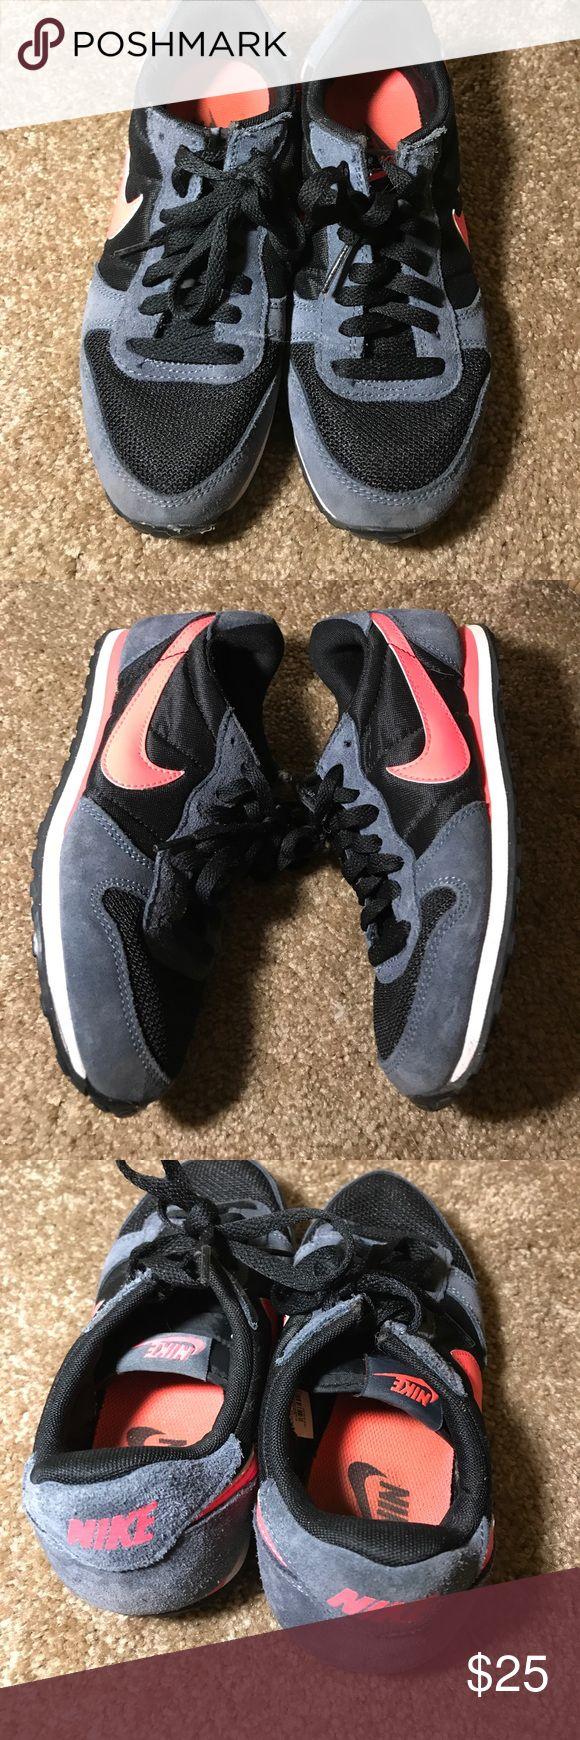 Pink/Gray Nike Pegasus Tennis Shoes Nike Size 6 shoes, retro look. Nike Shoes Athletic Shoes